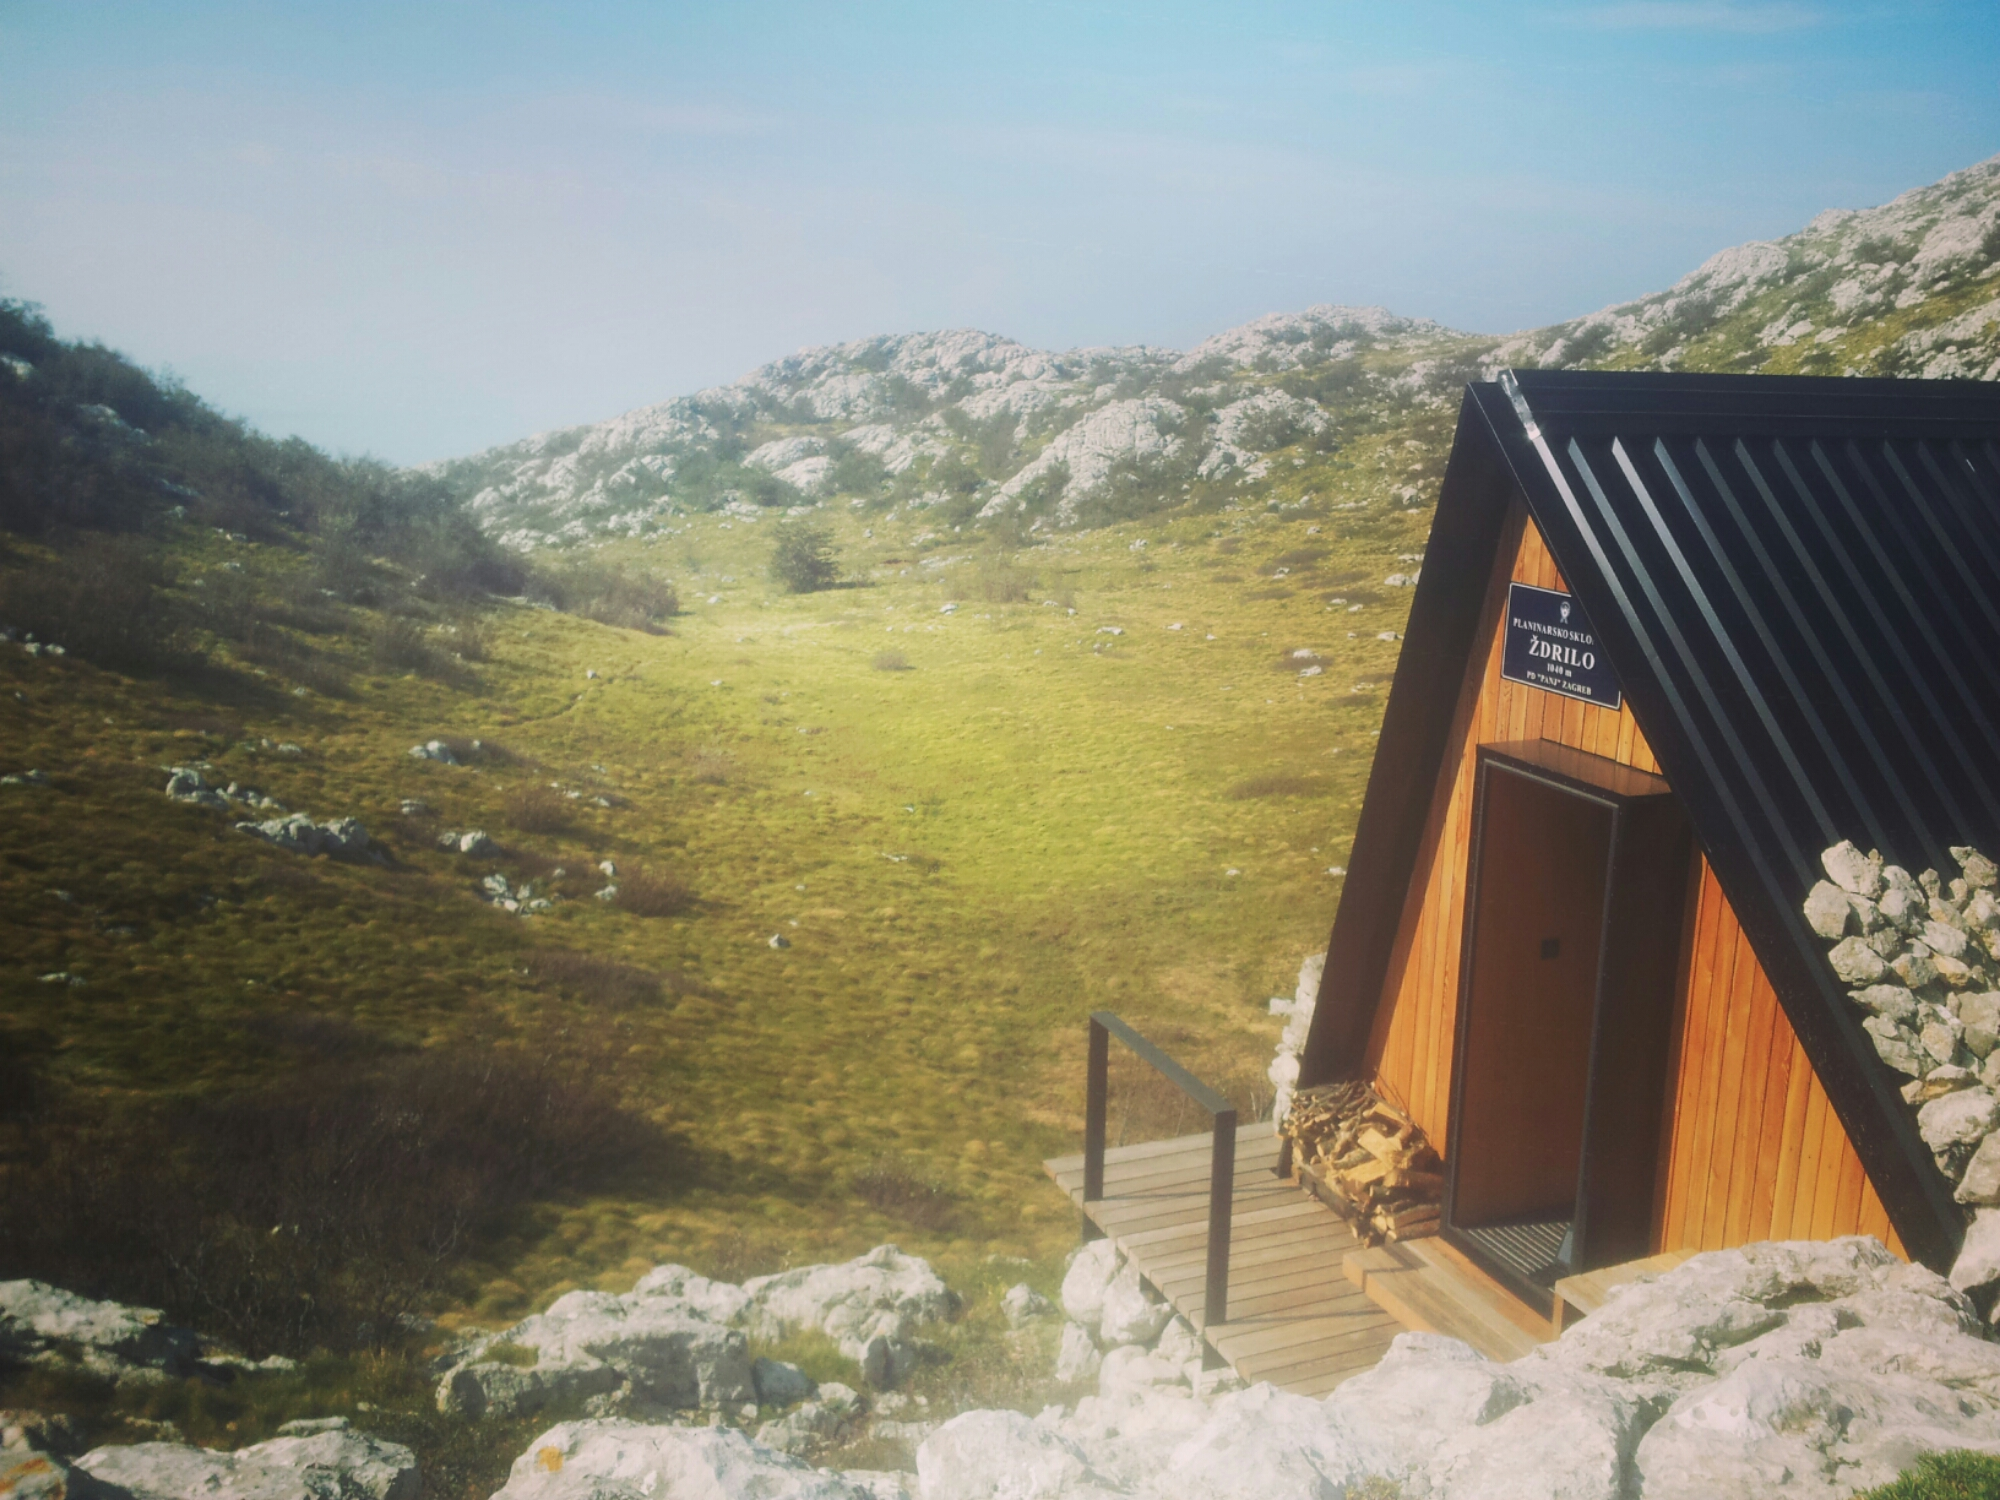 planinarsko-skloniste-zdrilo-velebit-trail-via-dinarica-croatia